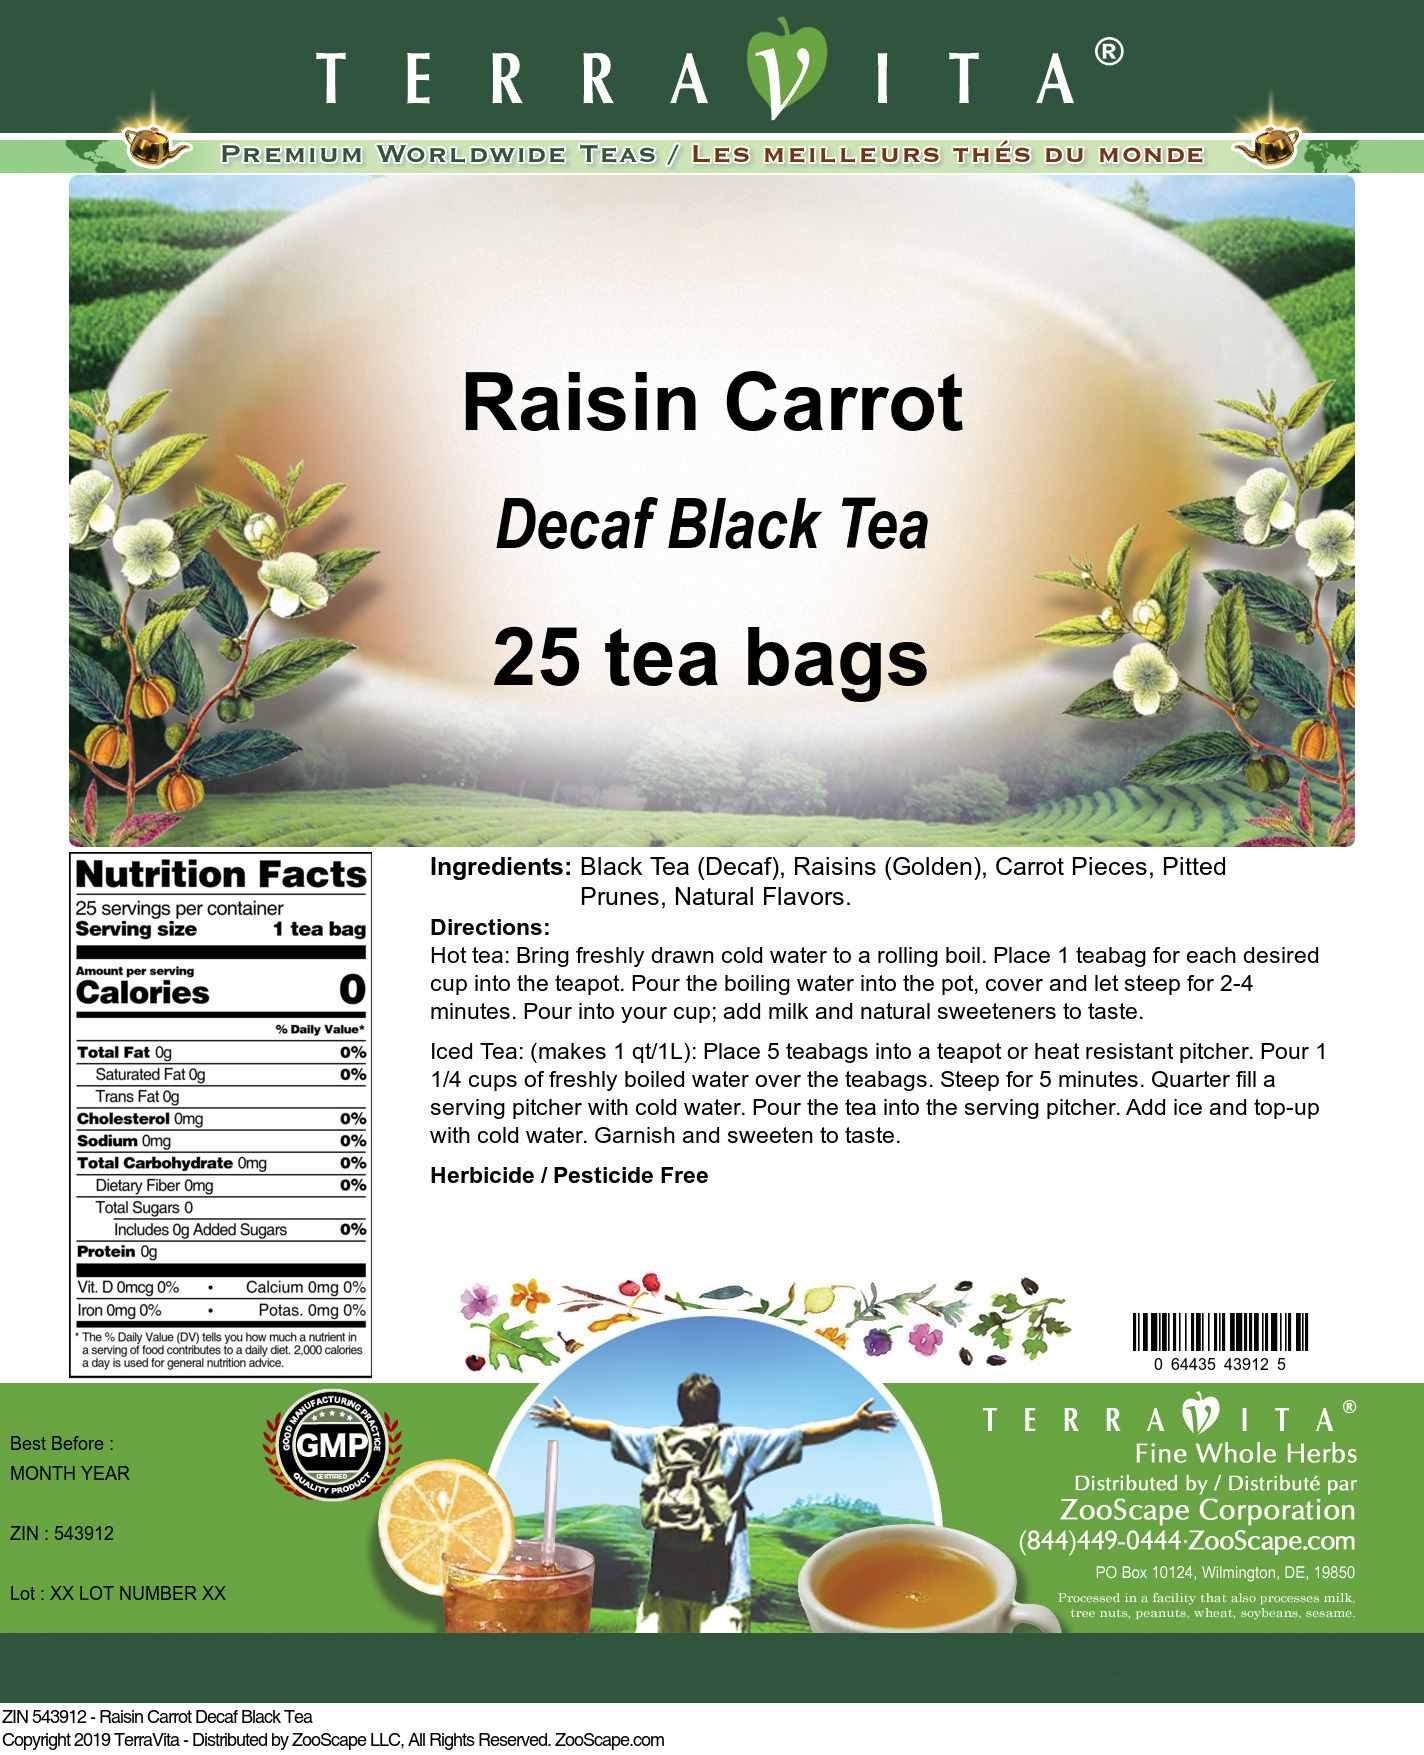 Raisin Carrot Decaf Black Tea